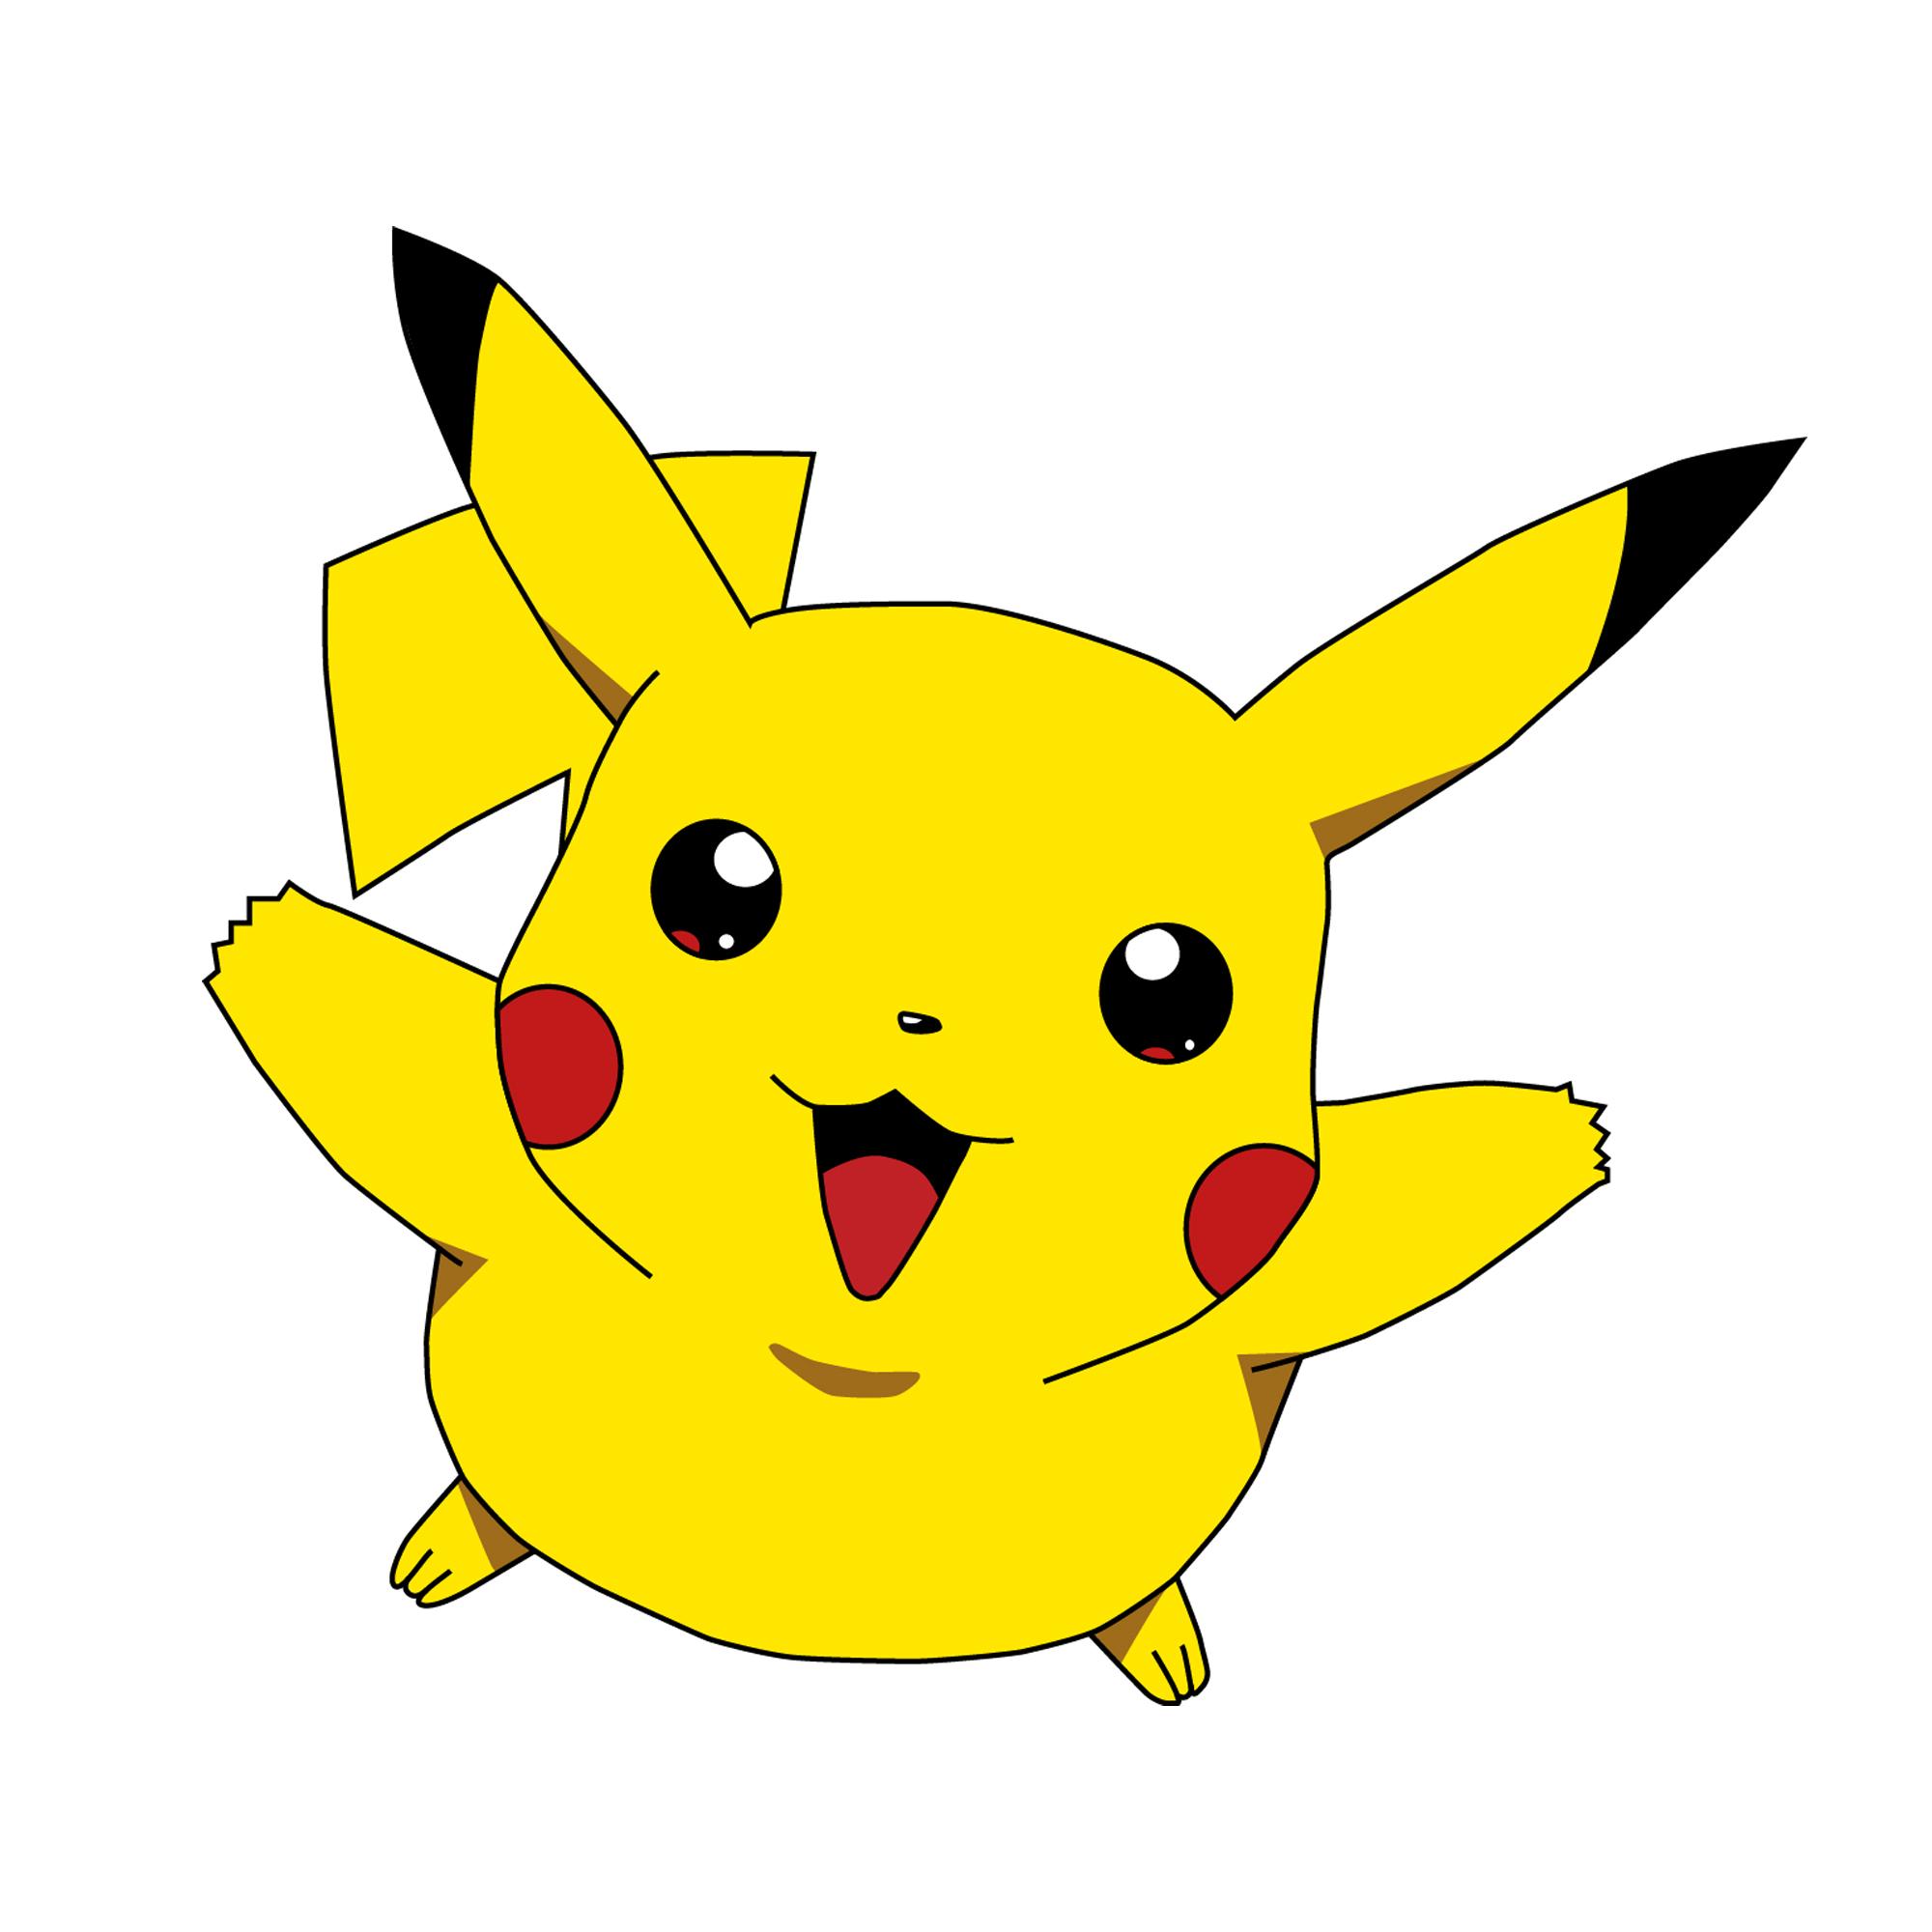 1-pikachu-pokemon-rederei-fm-bundespraesident